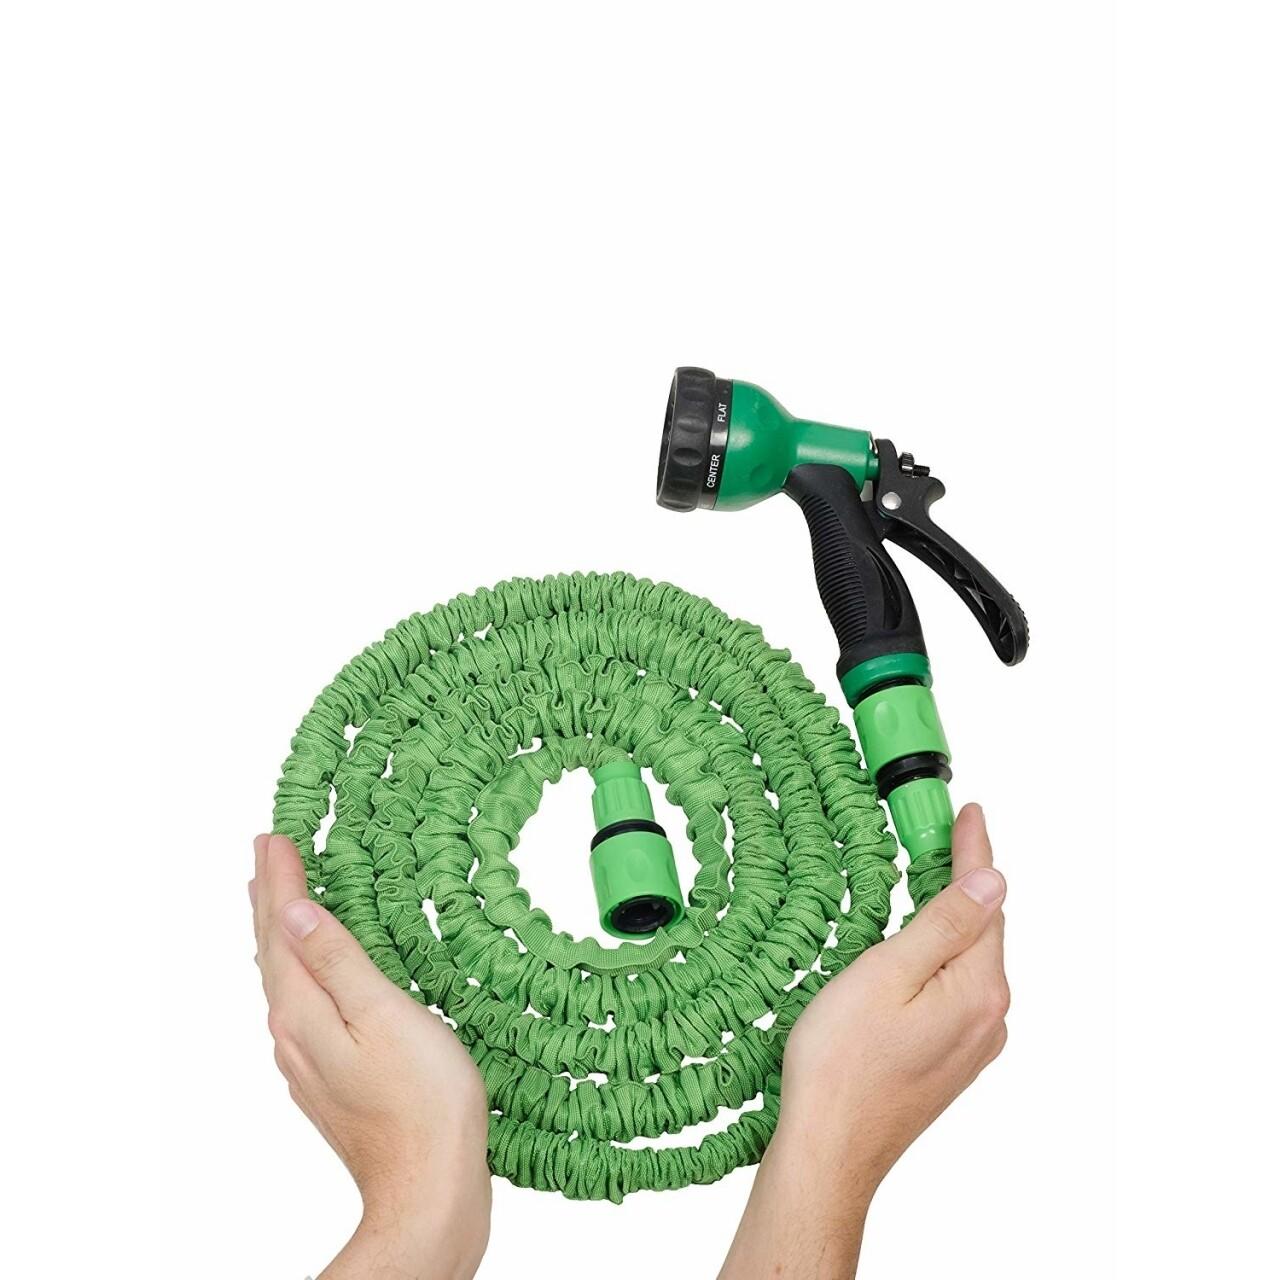 Furtun extensibil Green Jocca, 15 m, latex/poliester, verde